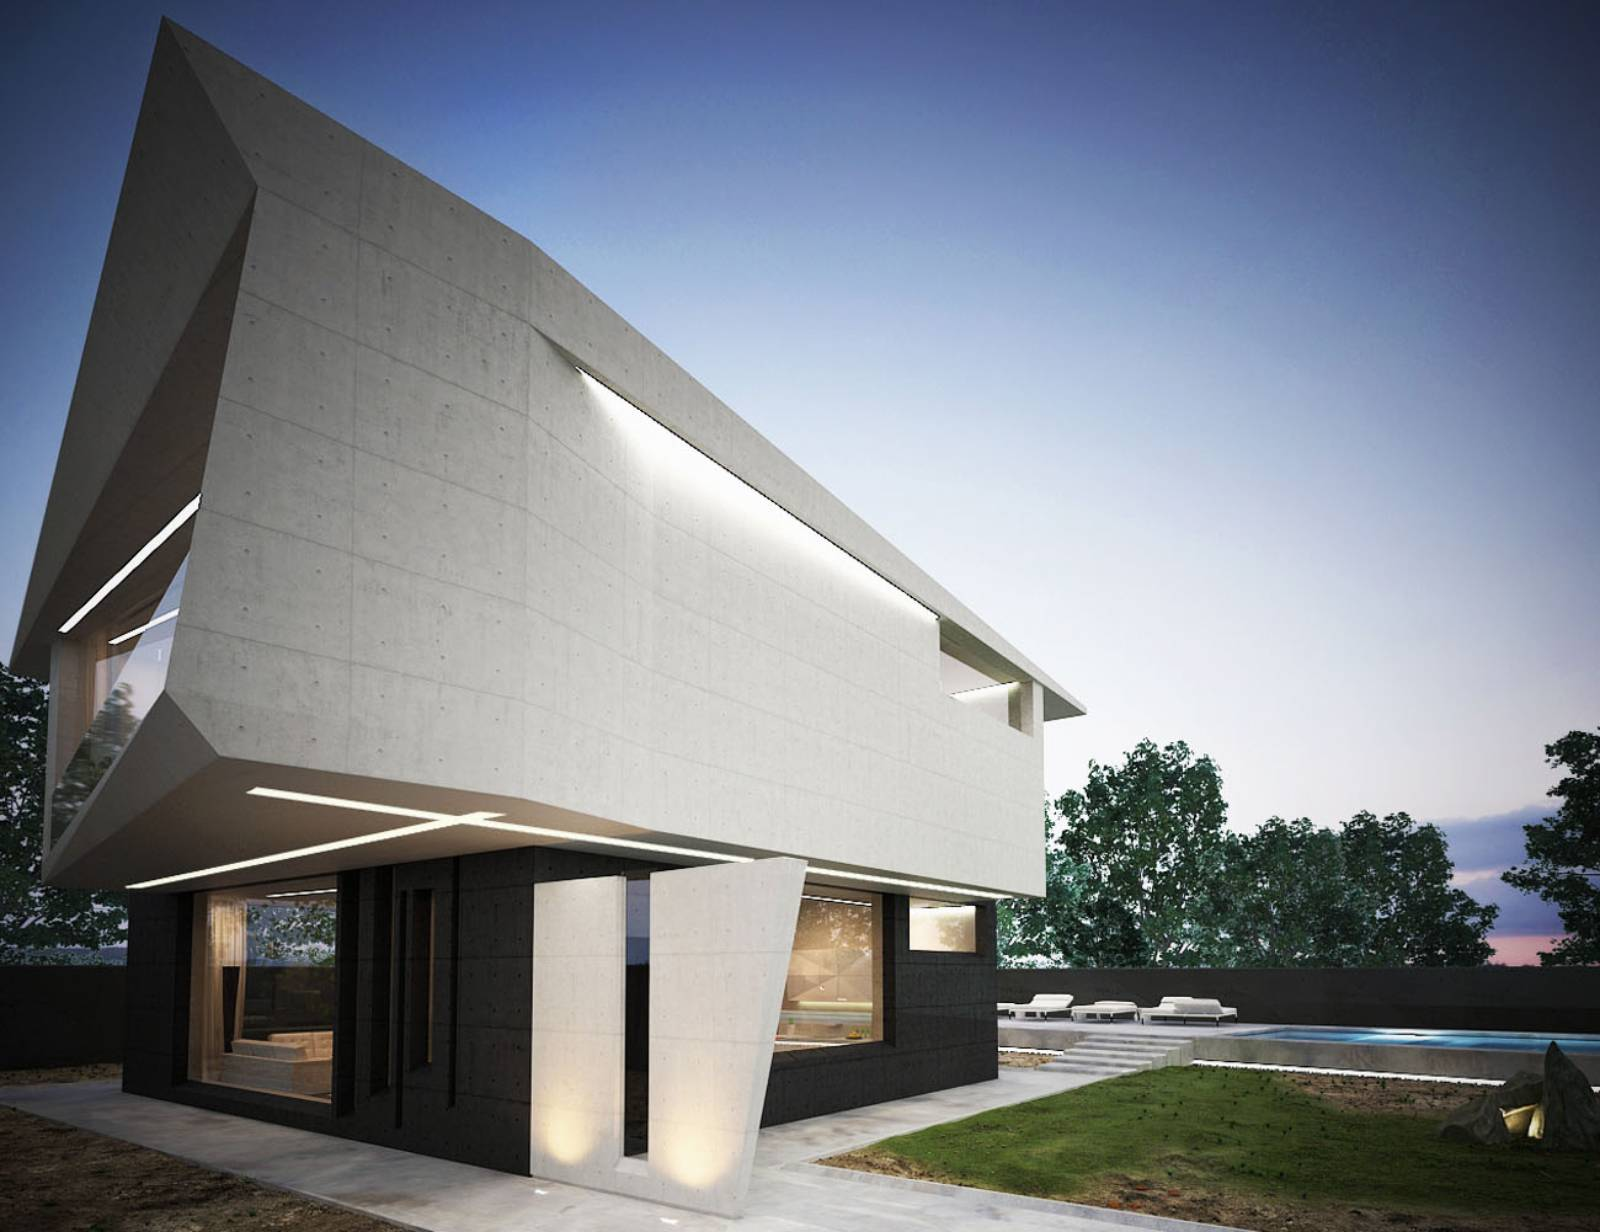 Sîngera, Moldavia: M House by Marcel Luchian Studio